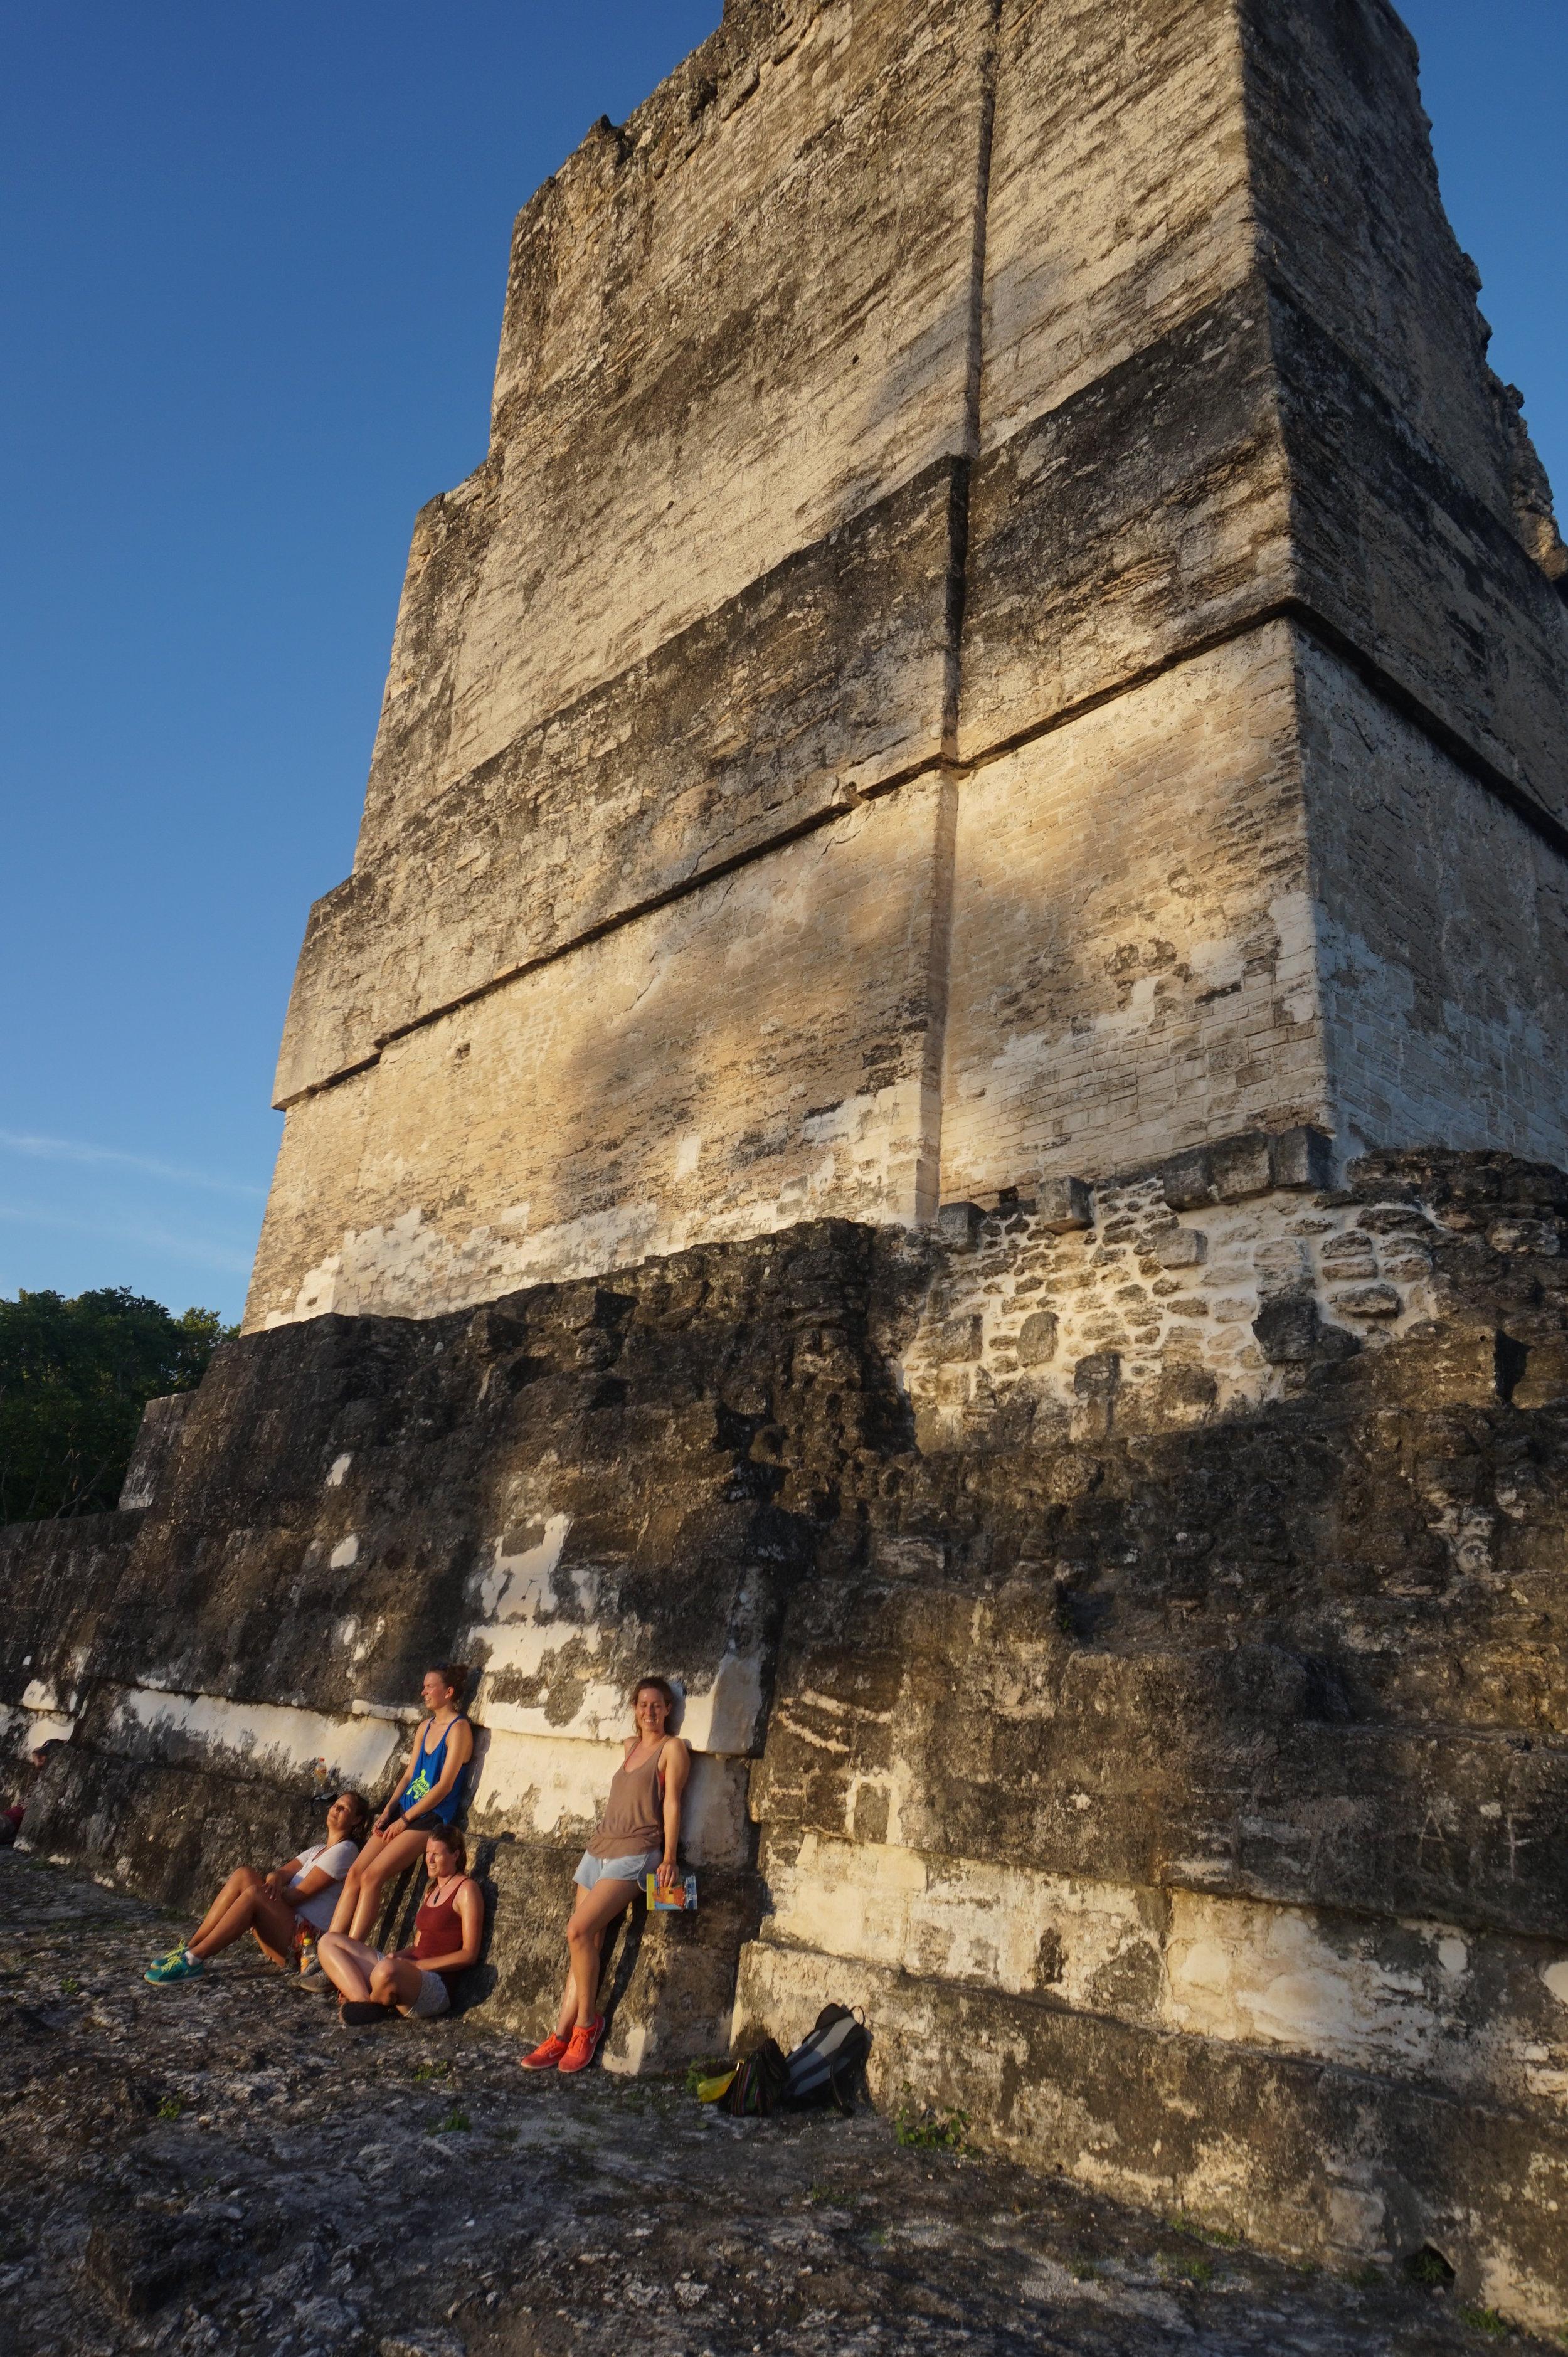 guatemala-tikal-ruins-2